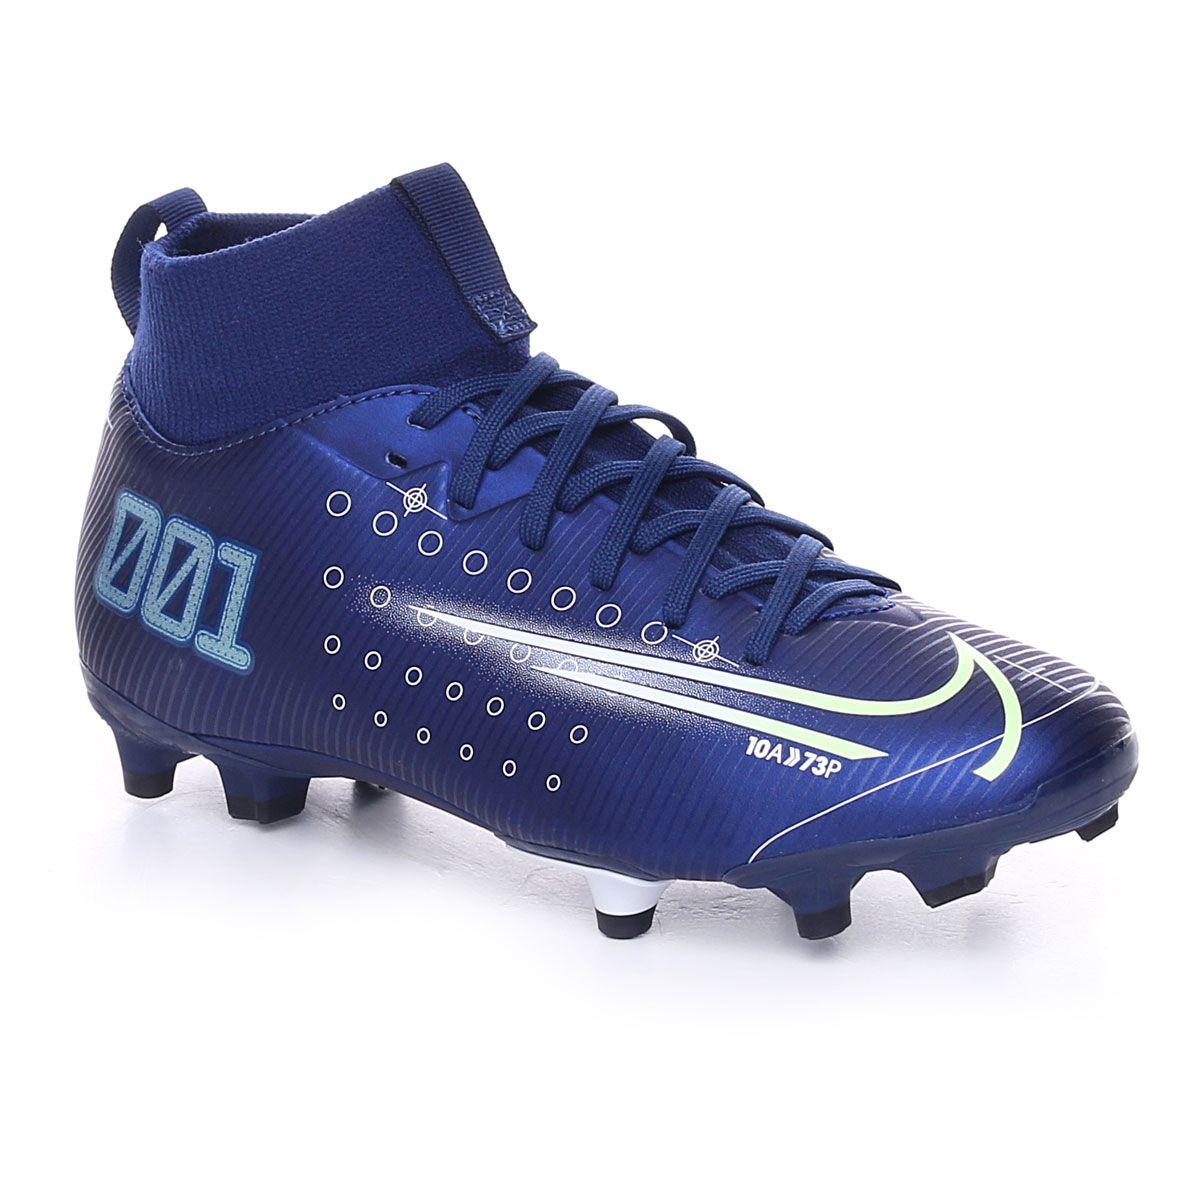 Nike Jr. Mercurial Superfly 7 Academy Mds Mg Blue Void Metallic Silver